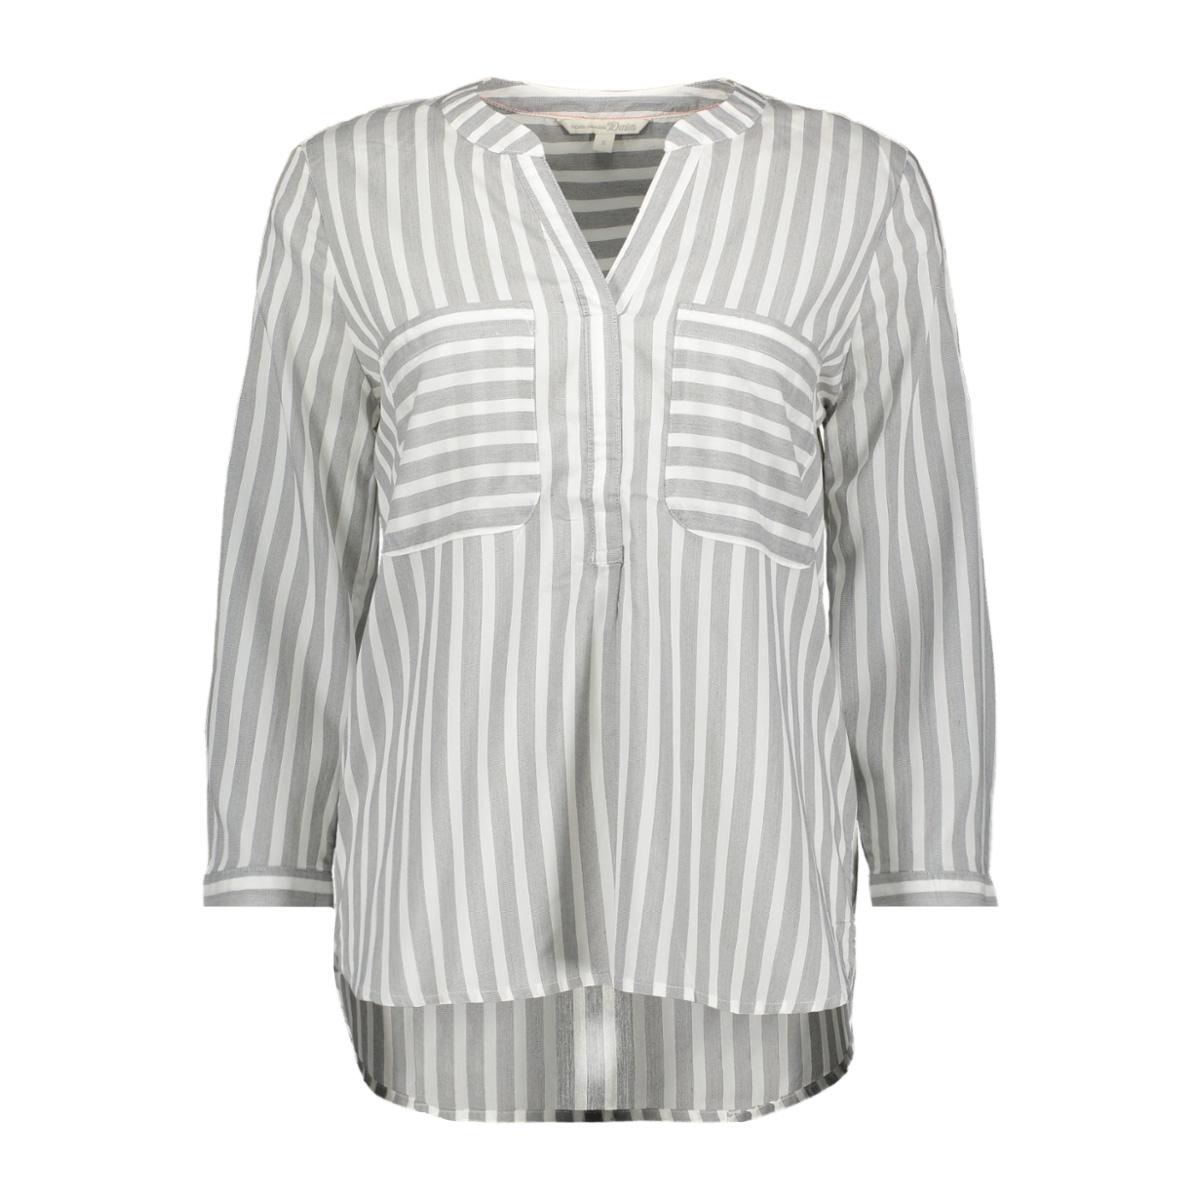 blouse met streeppatroon 1012606xx71 tom tailor blouse 13293